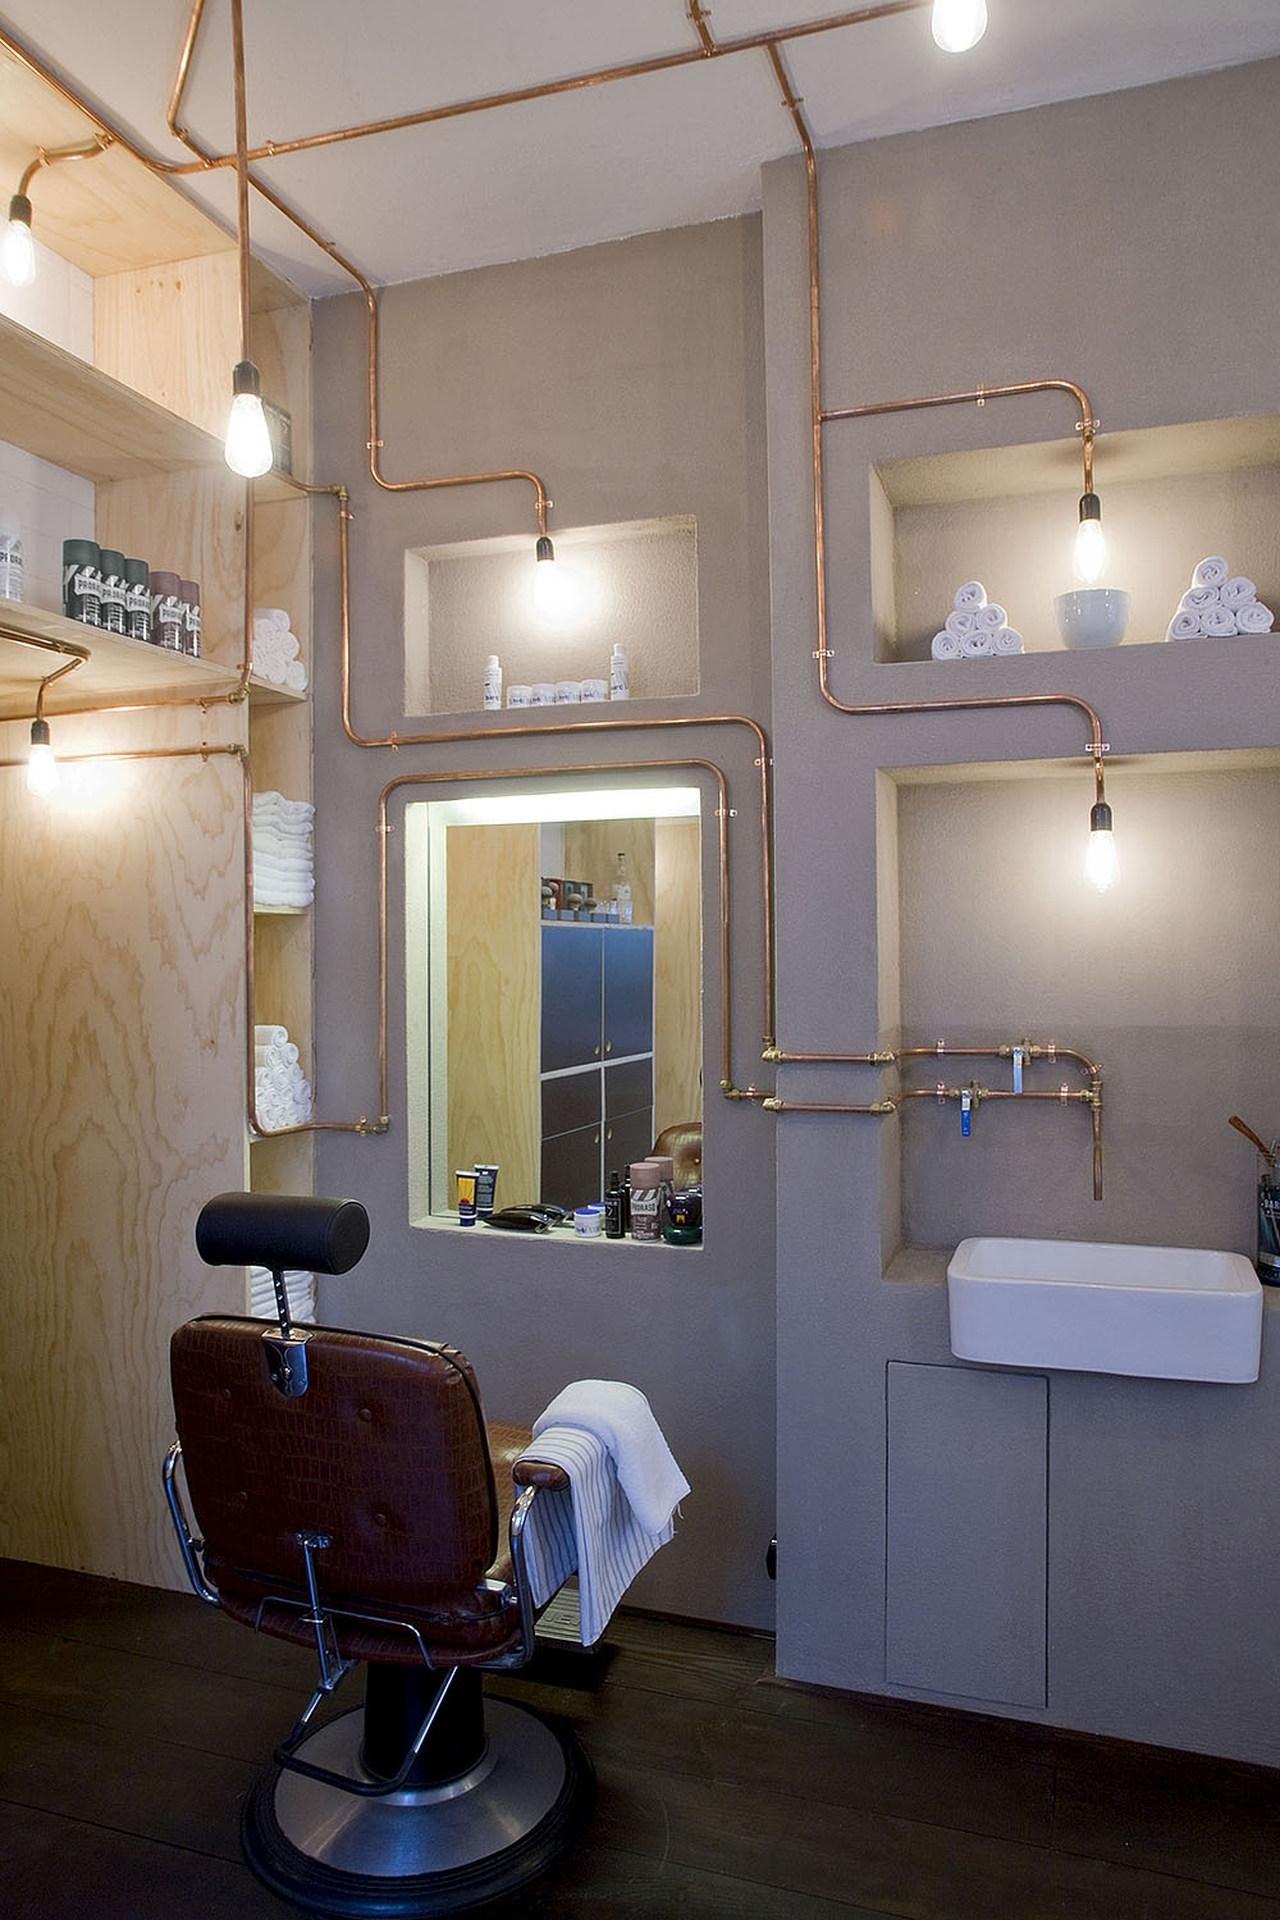 Barber shop by ard hoksbergen karmatrendz - Barber shop interior ...